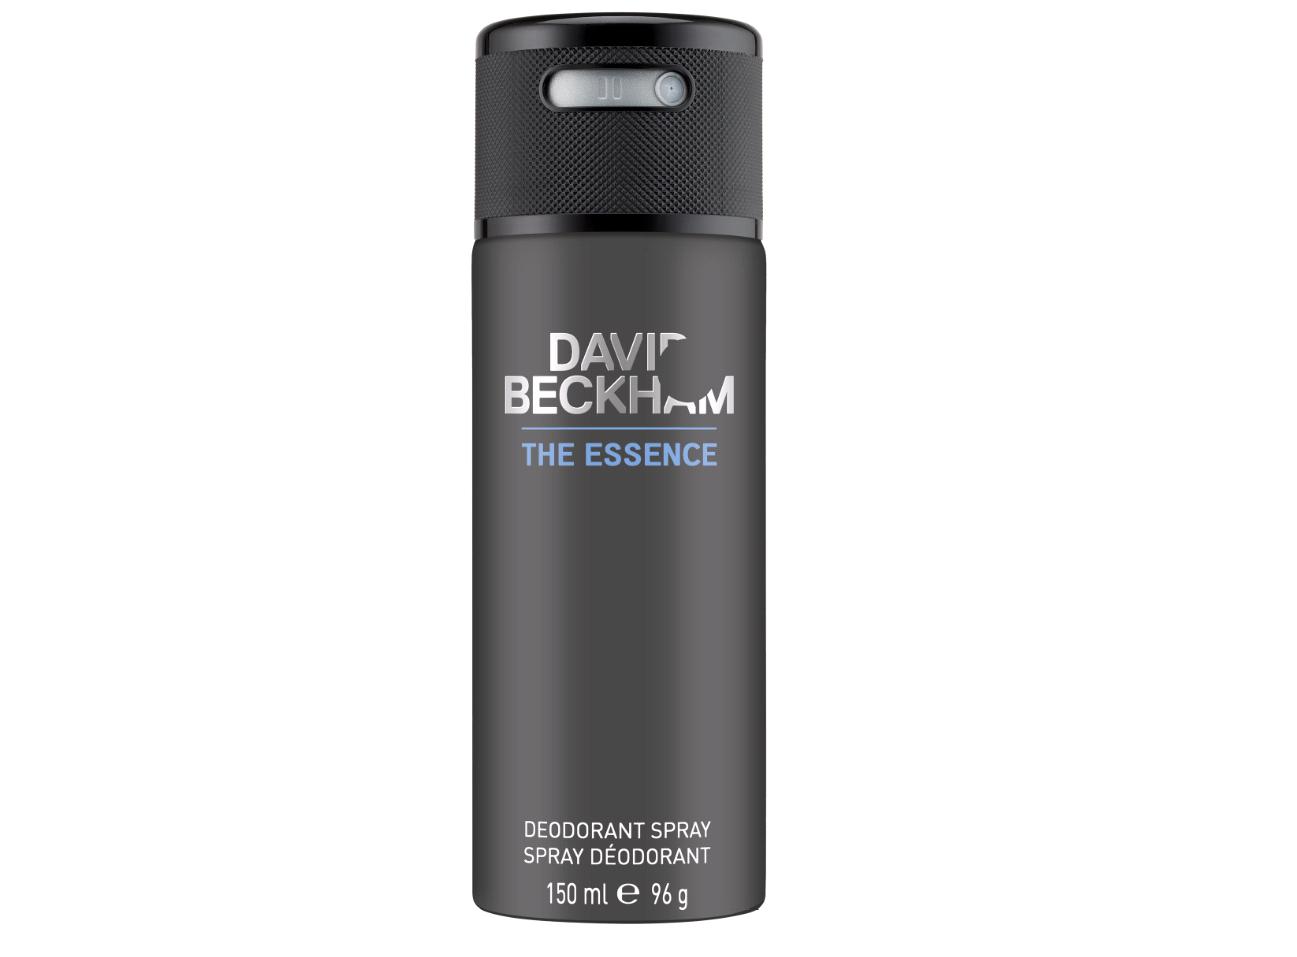 David Beckham -The Essence - Deodorant Spray 150 ml